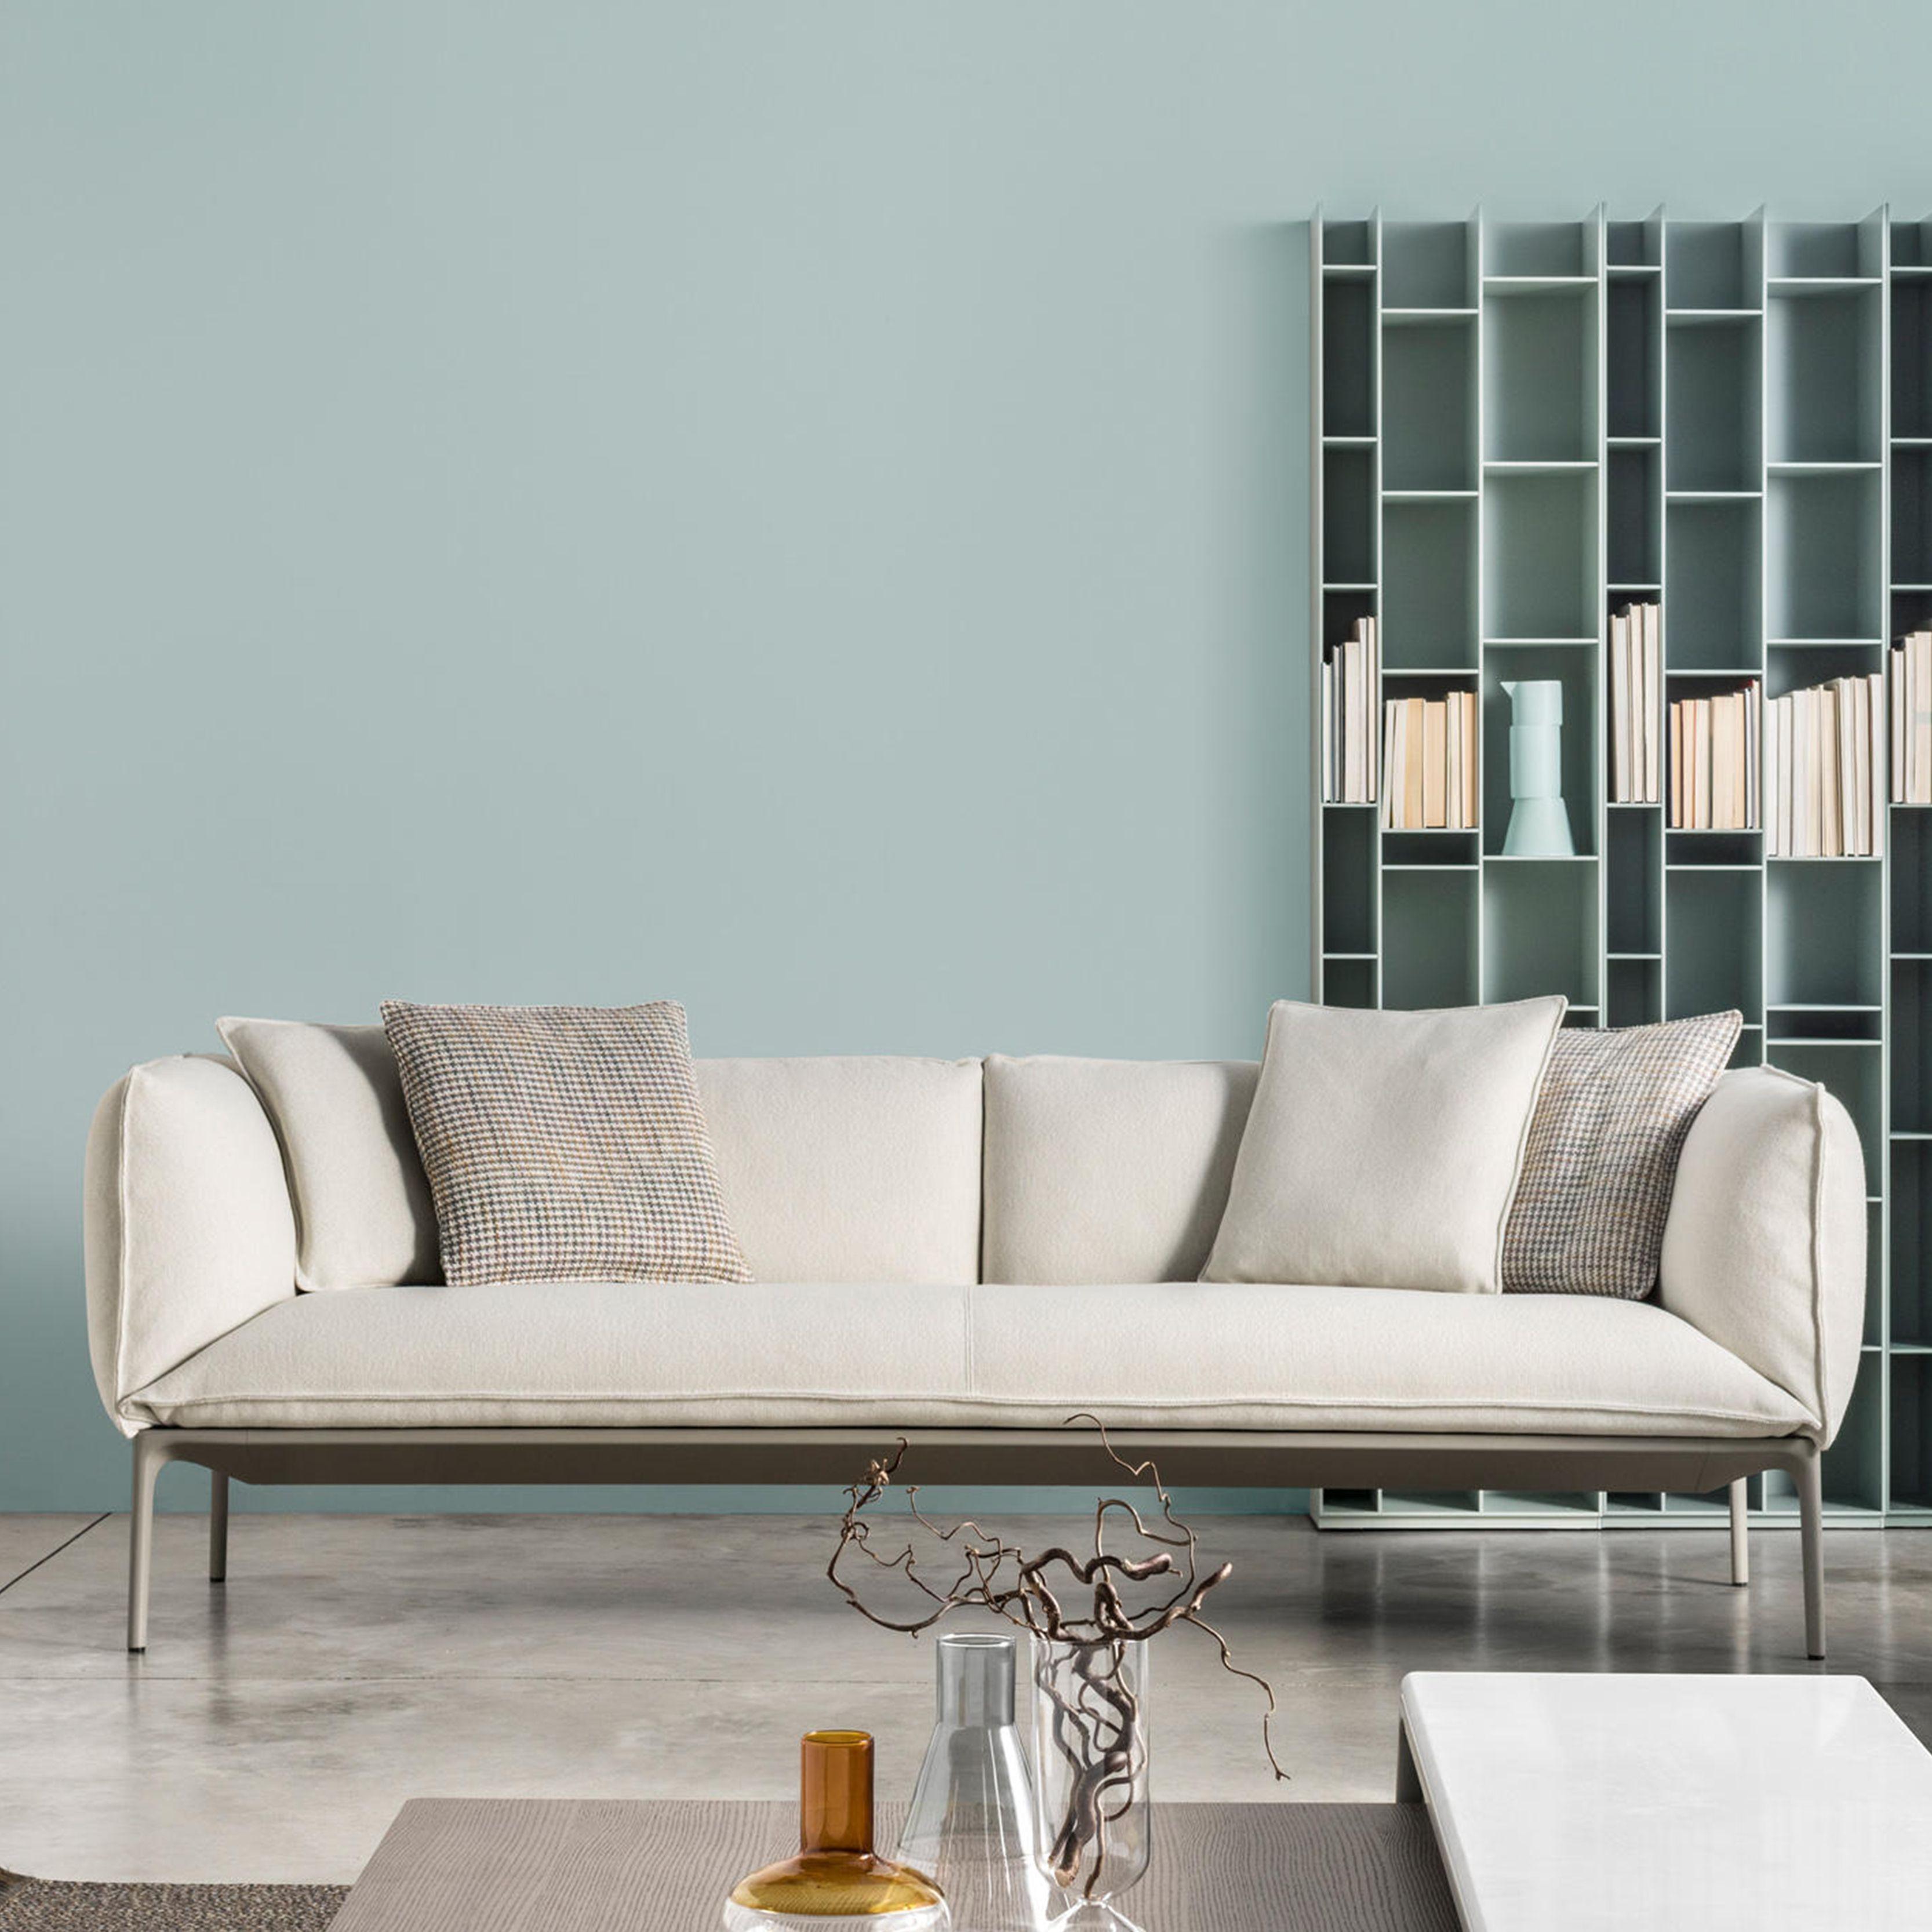 Premium Italian Furniture Brands In India Vivono Brings Luxury Italian Furniture Brands In Italian Furniture Brands Luxury Italian Furniture Italian Furniture